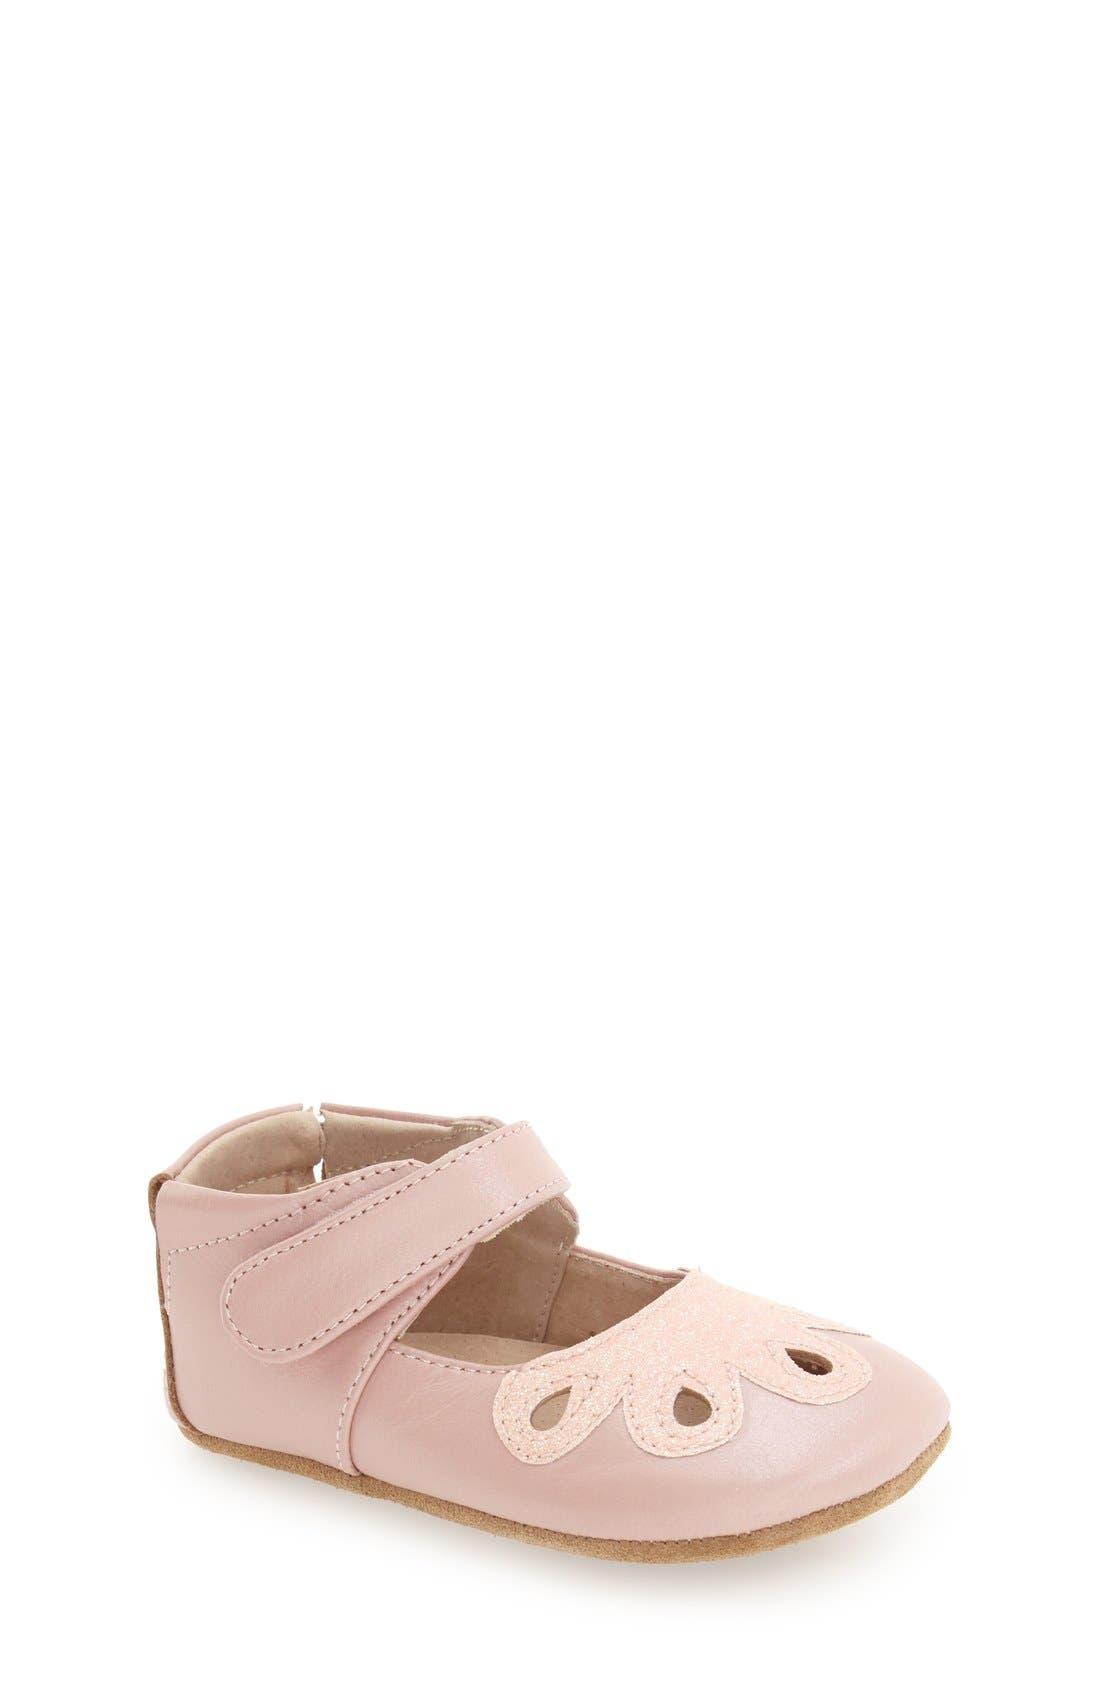 LIVIE & LUCA Petal Mary Jane Crib Shoe